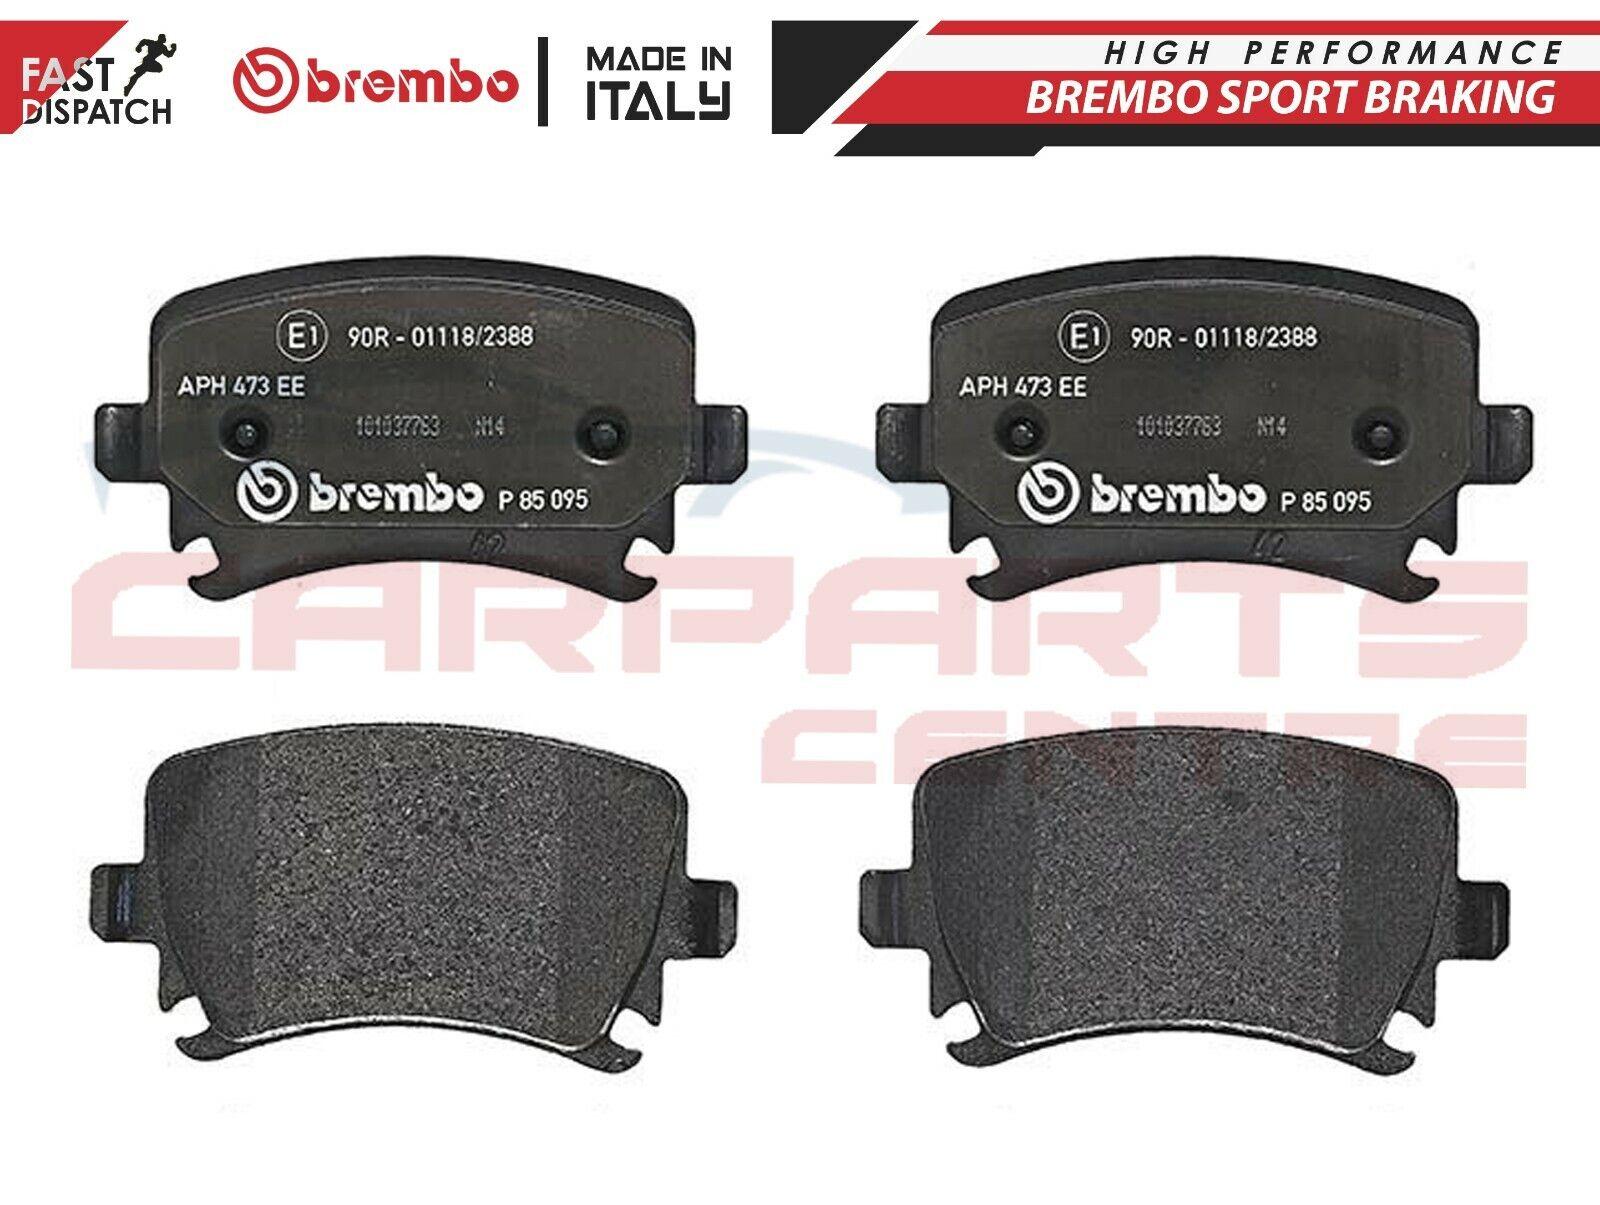 Set of 4 Brembo P85095 Rear Disc Brake Pad